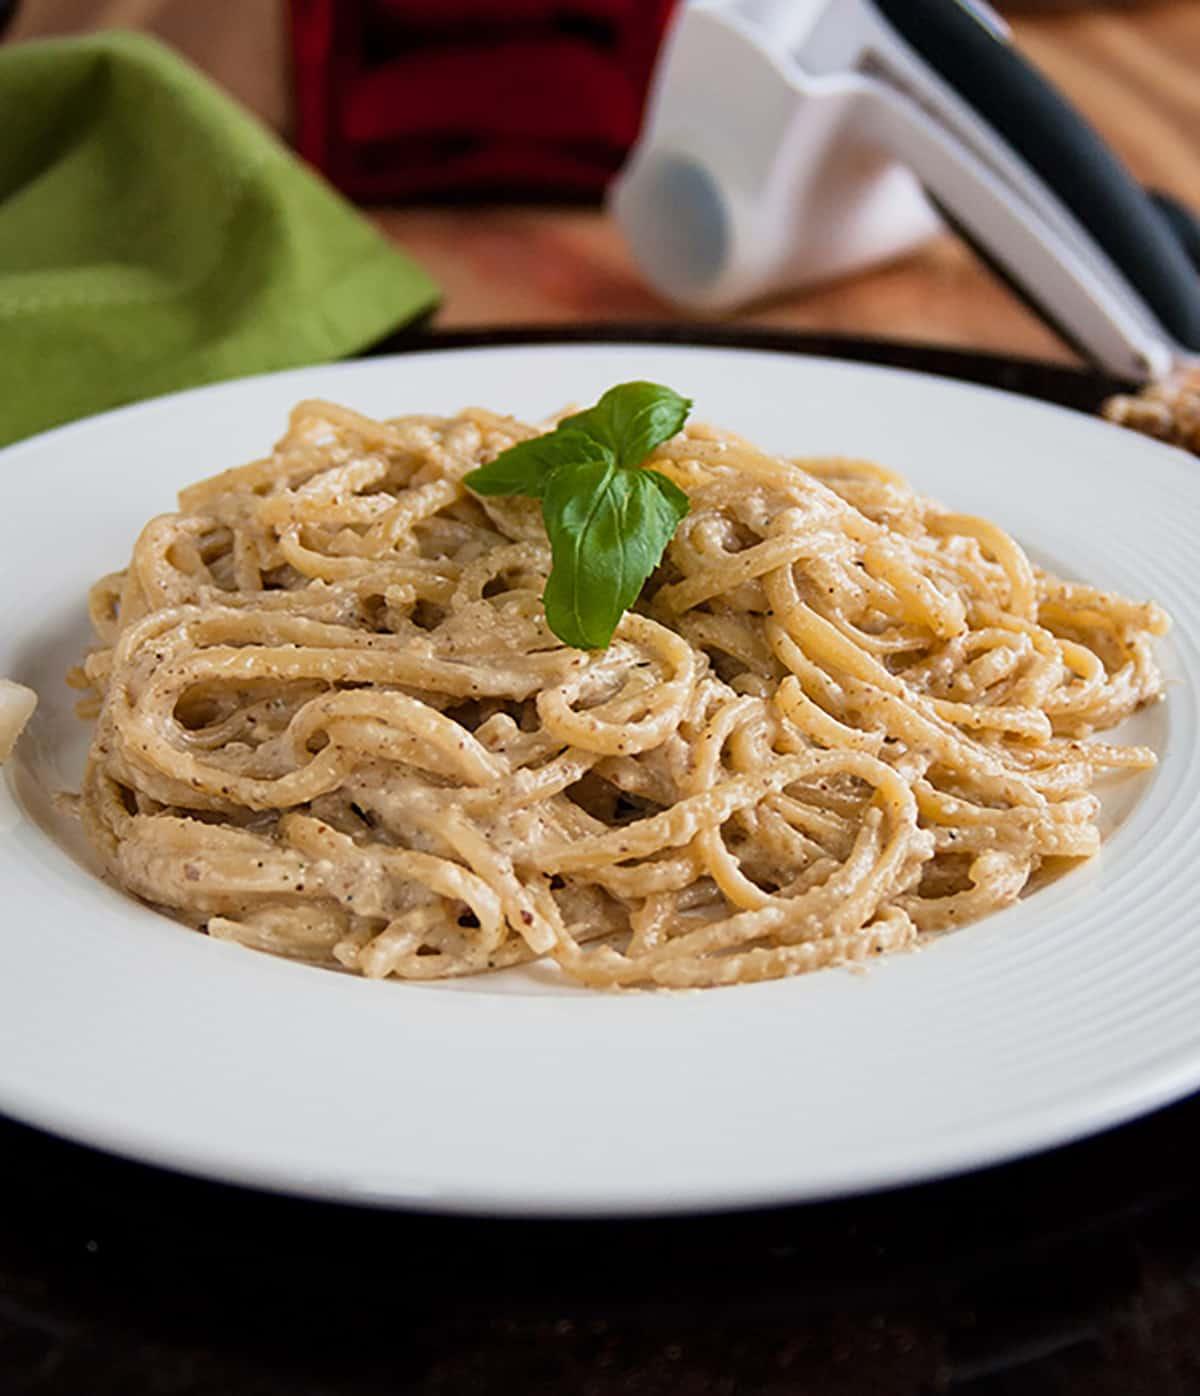 bowl of spaghetti with creamy sauce, basil